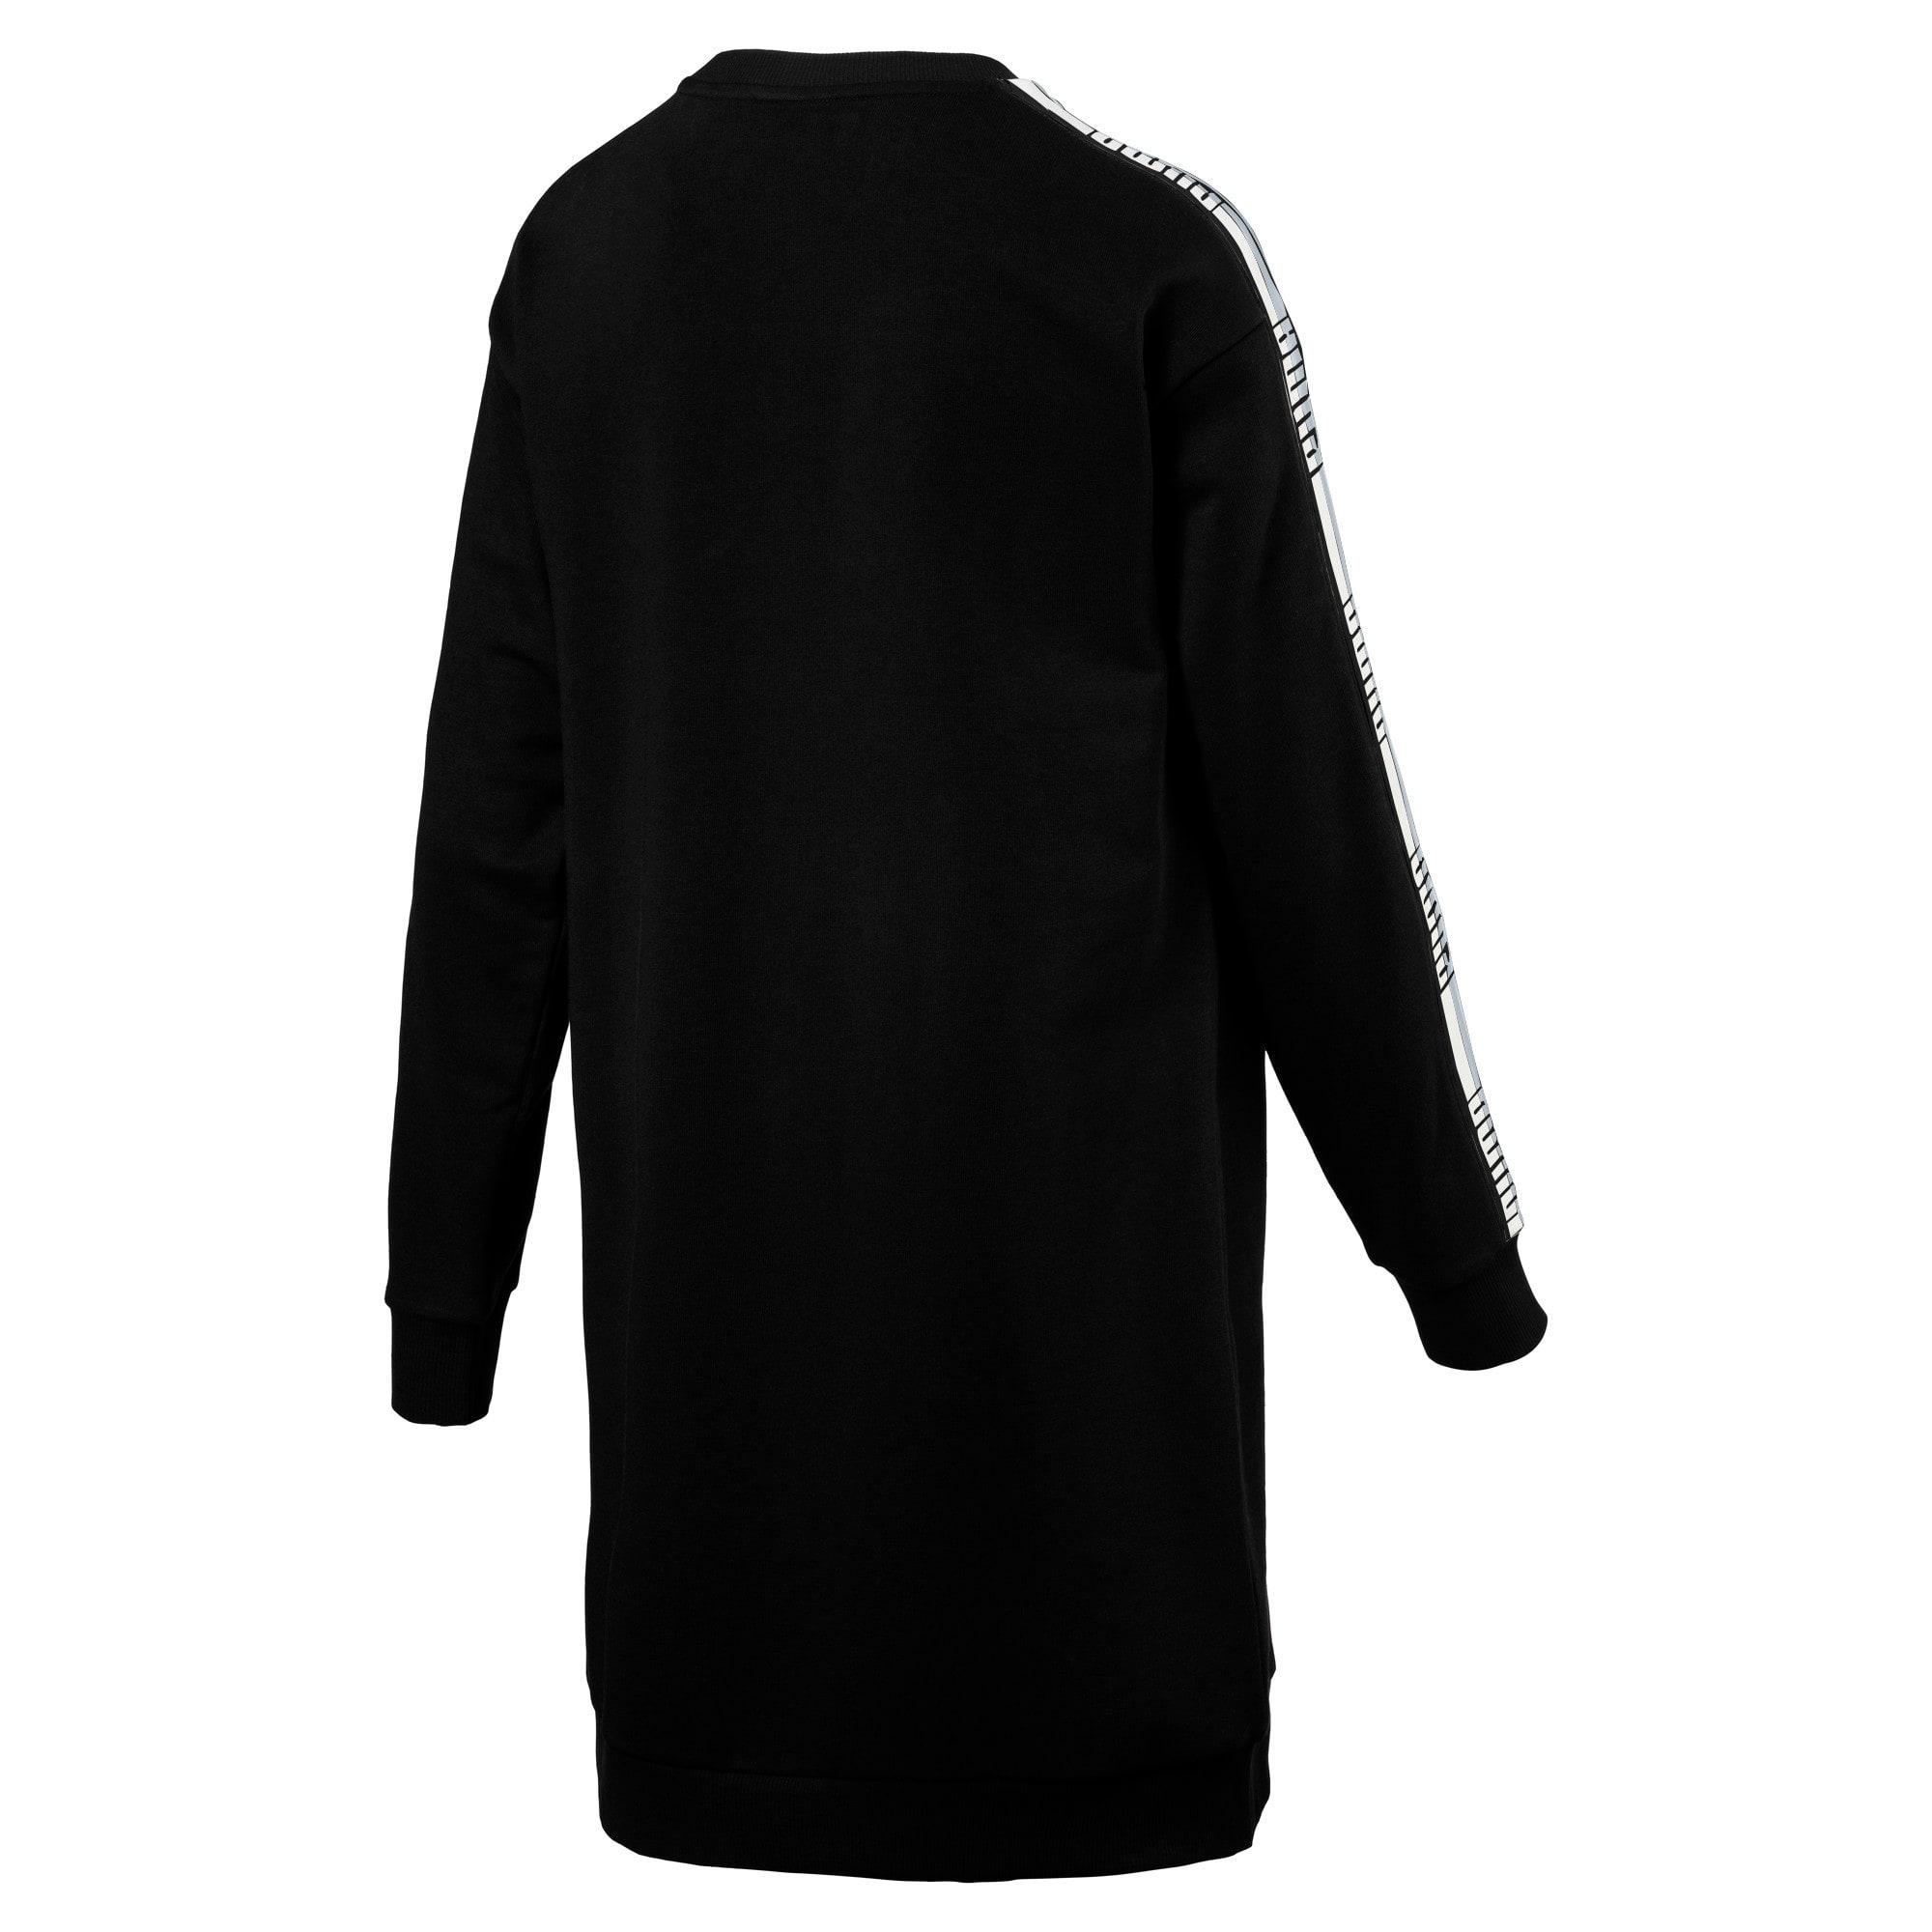 Thumbnail 3 of Tape Terry Women's Dress, Cotton Black, medium